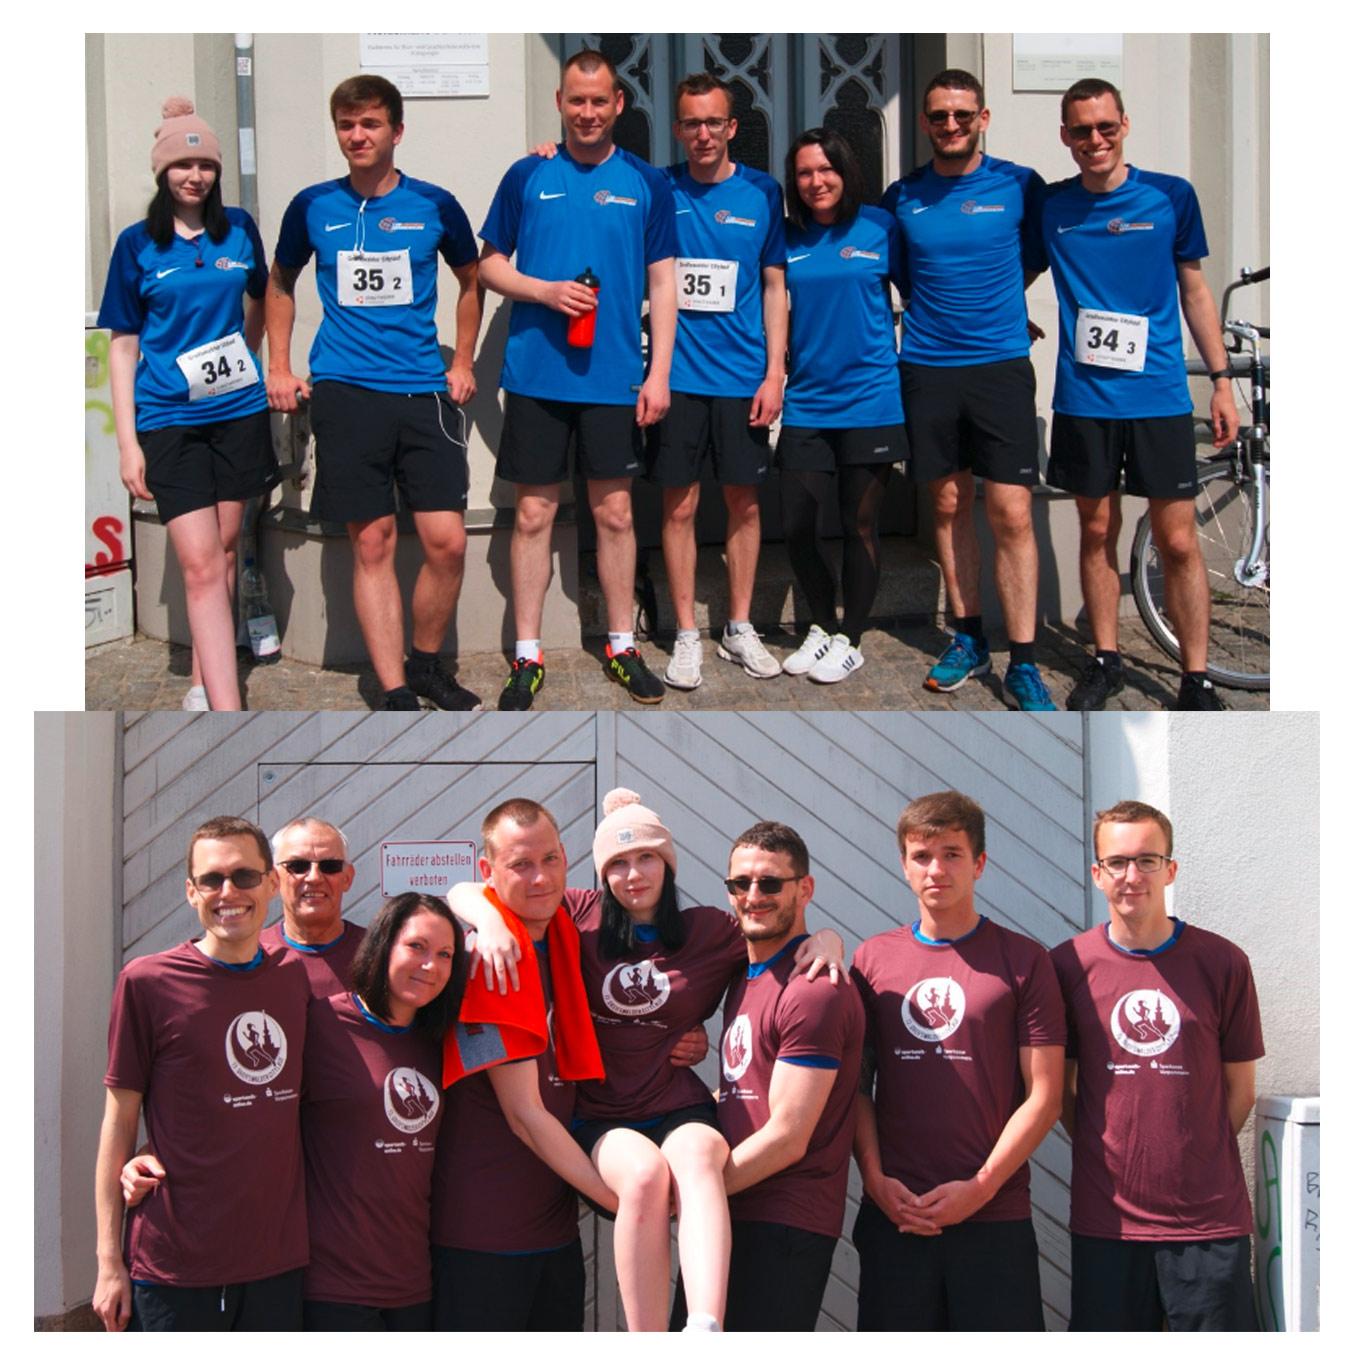 KDW Greifswald |Teilnahme beim 13. Greifswalder Citylauf am 18. Mai 2019